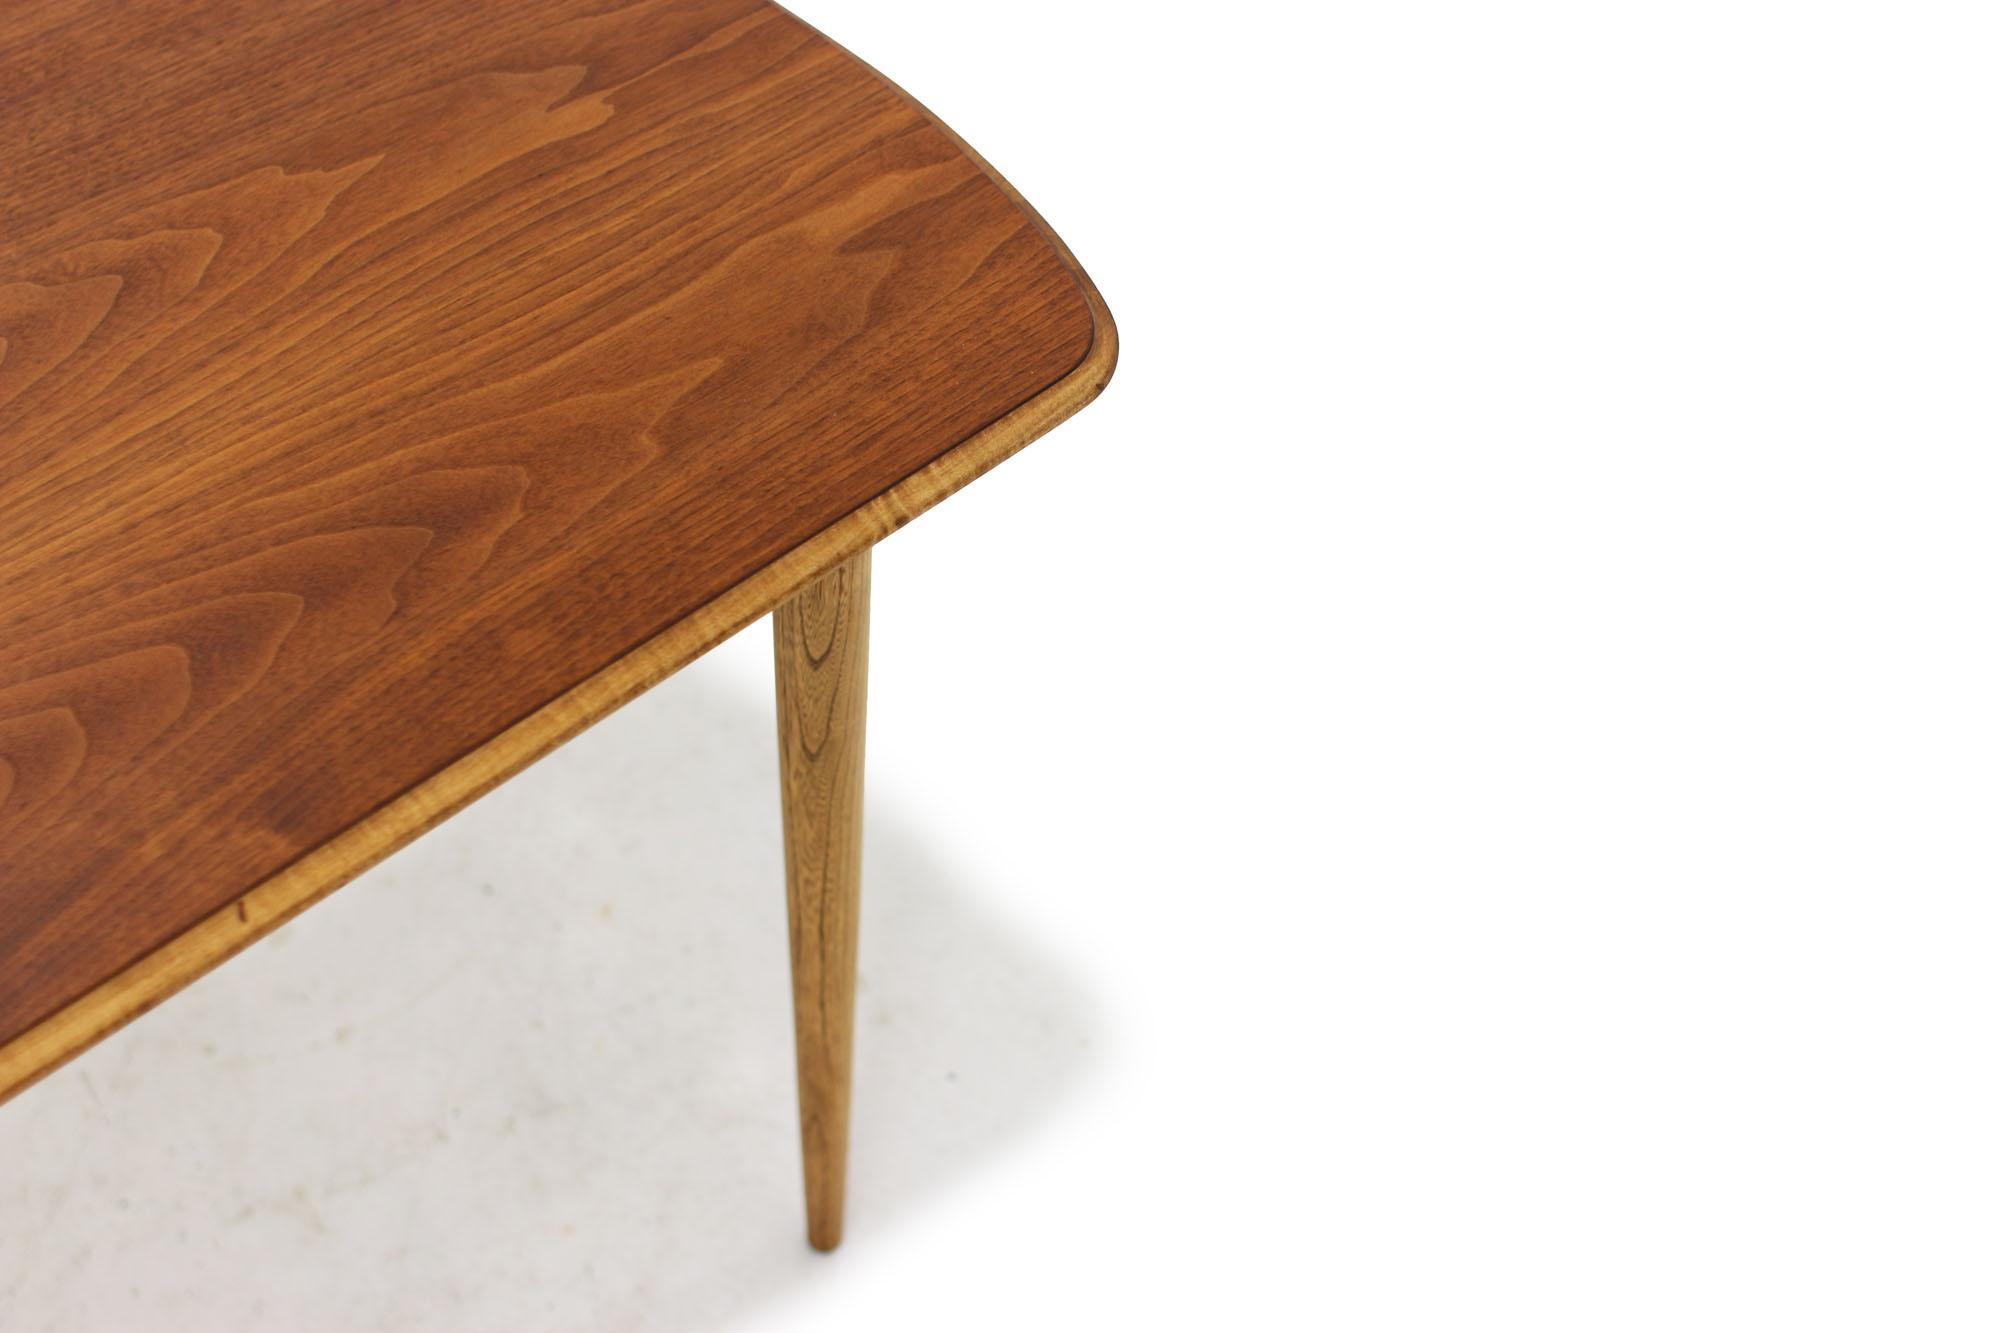 Walnut Deilcraft Dining Table (2).jpg